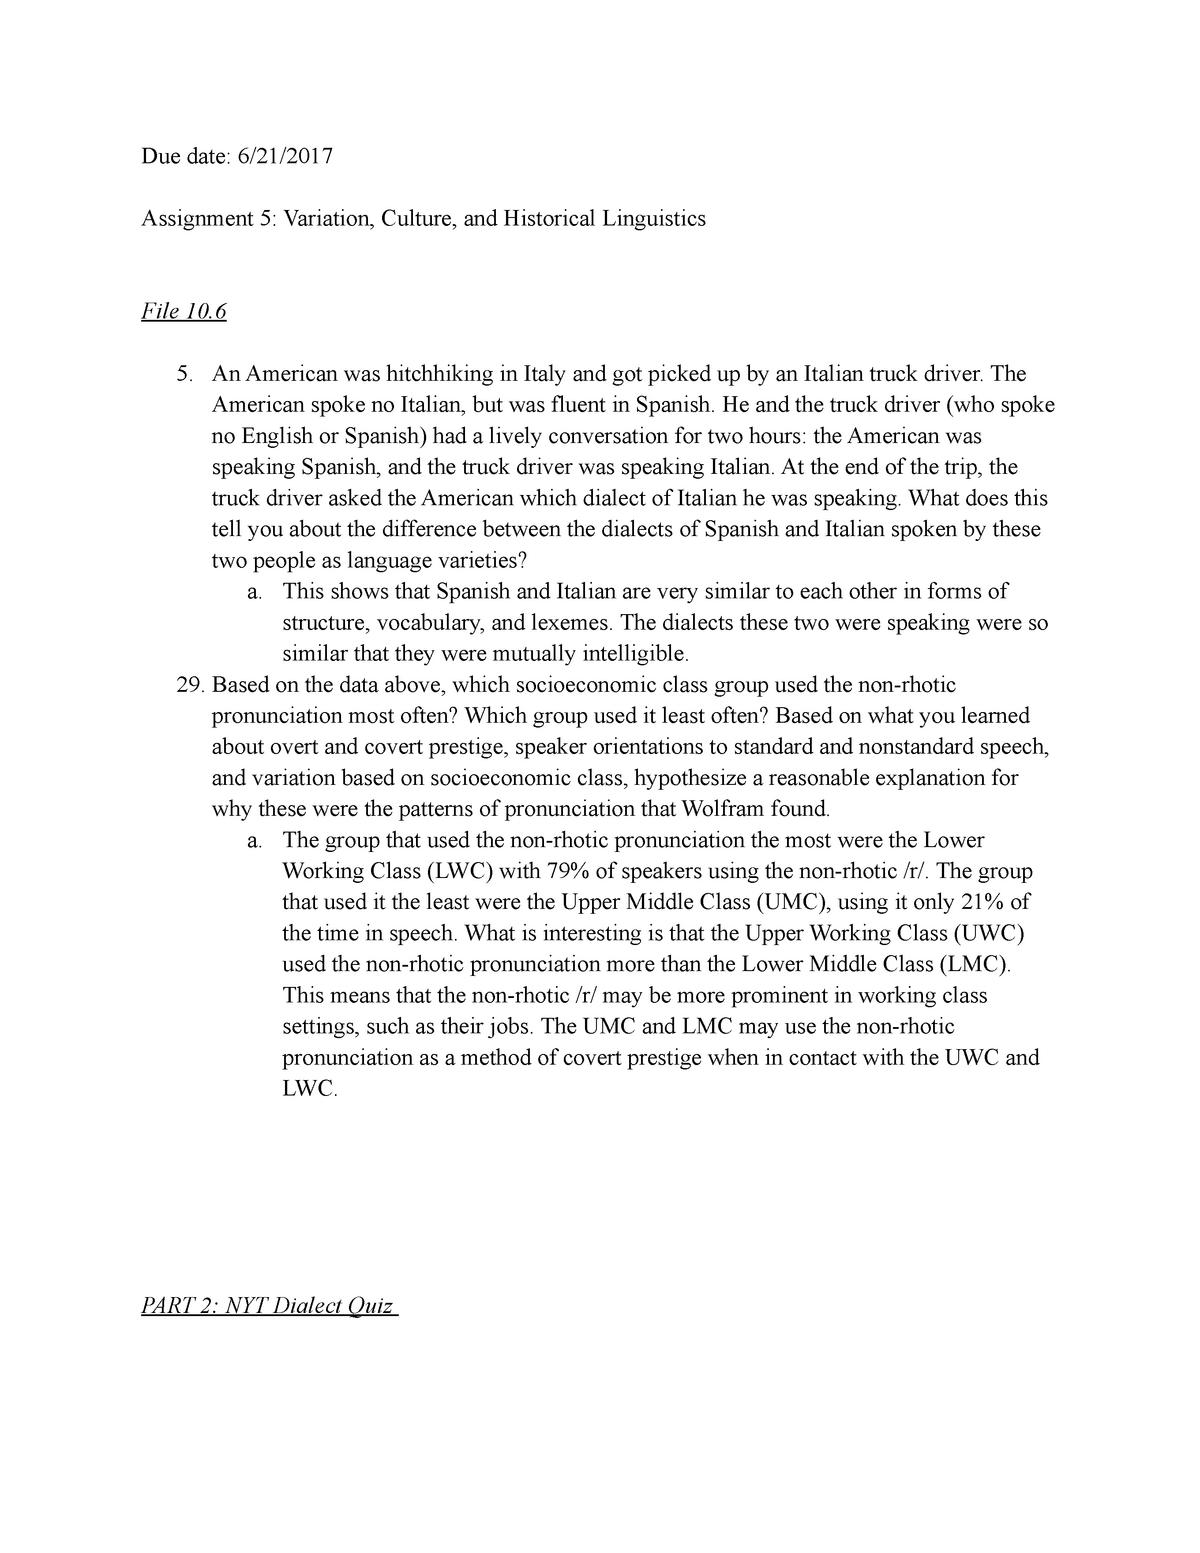 Assignment 5: Variation, Culture, and Historical Linguistics